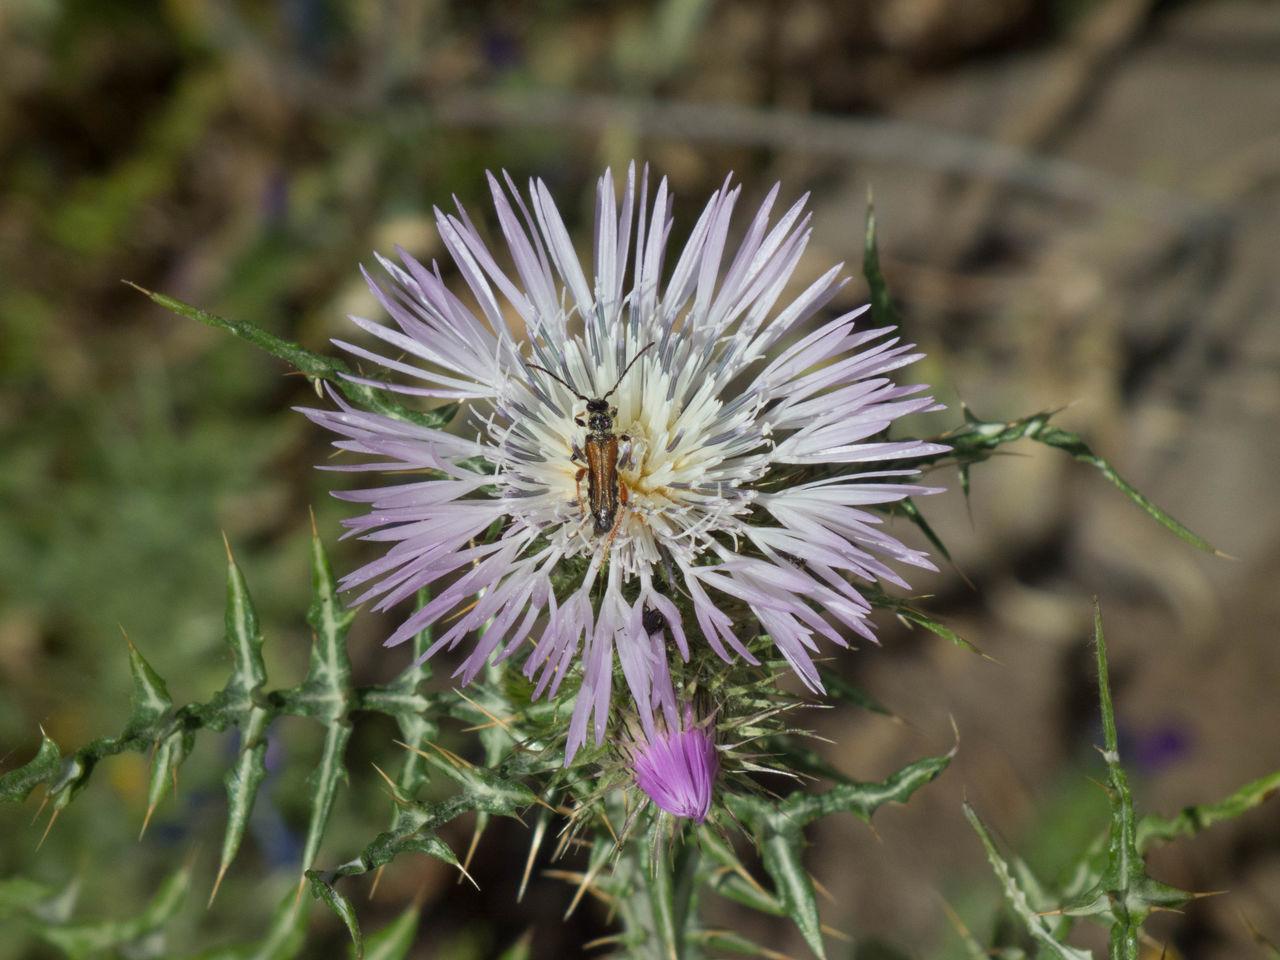 Blooming Botany Cardo Flower Insetto Nature Sardegna Sardinia